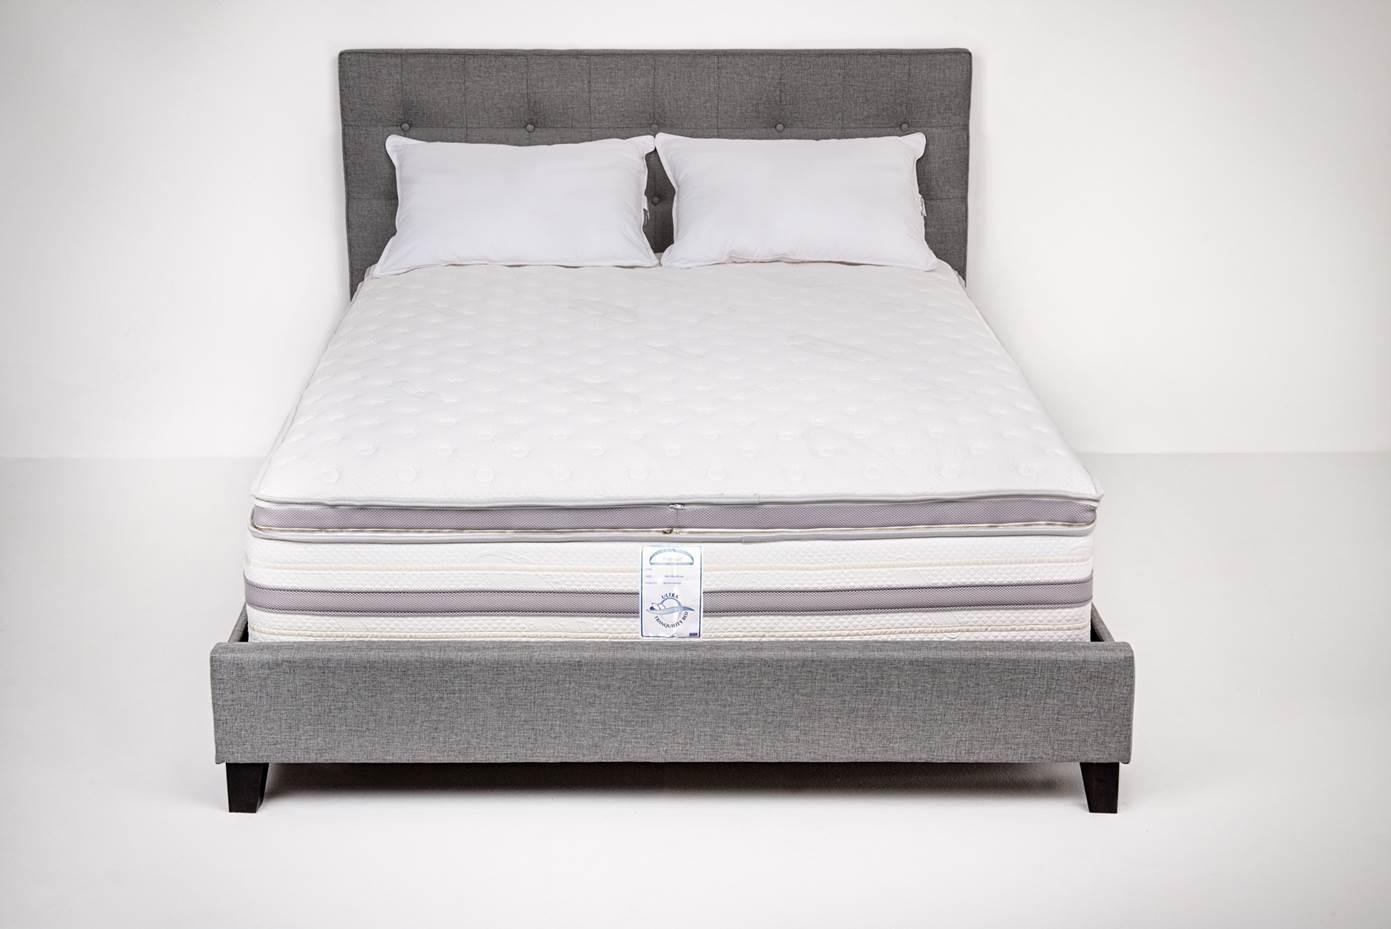 Elite Slumber Bed Mattress